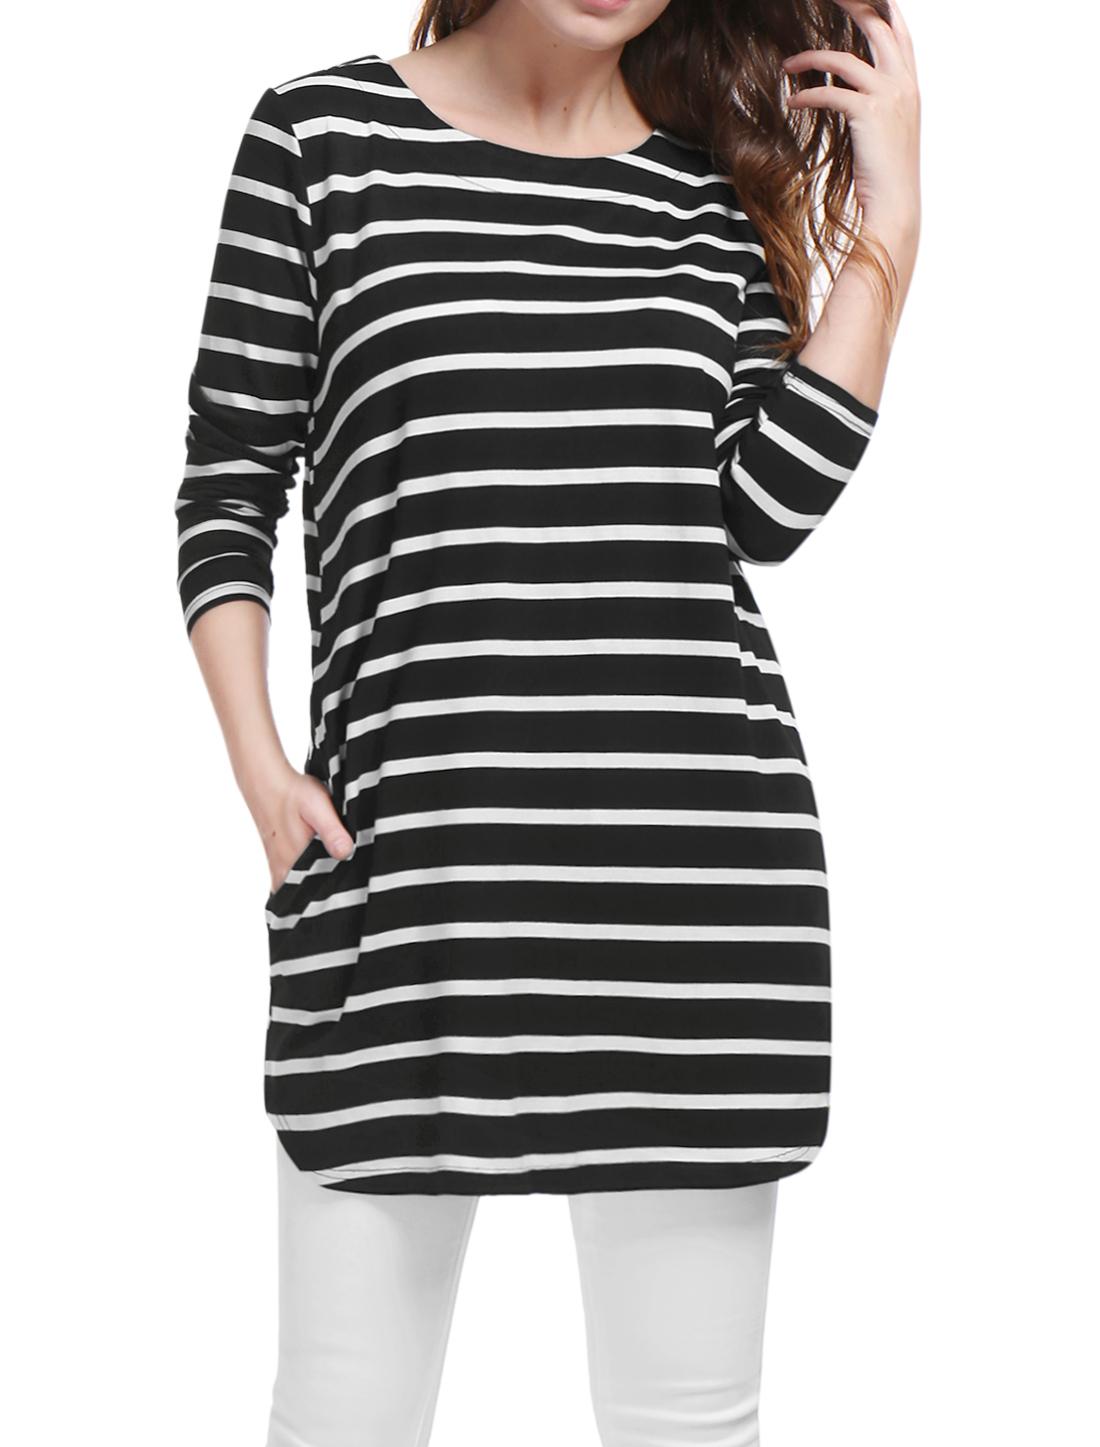 Allegra K Women Stripes Long Sleeves Pockets Loose Tunic Top Black L